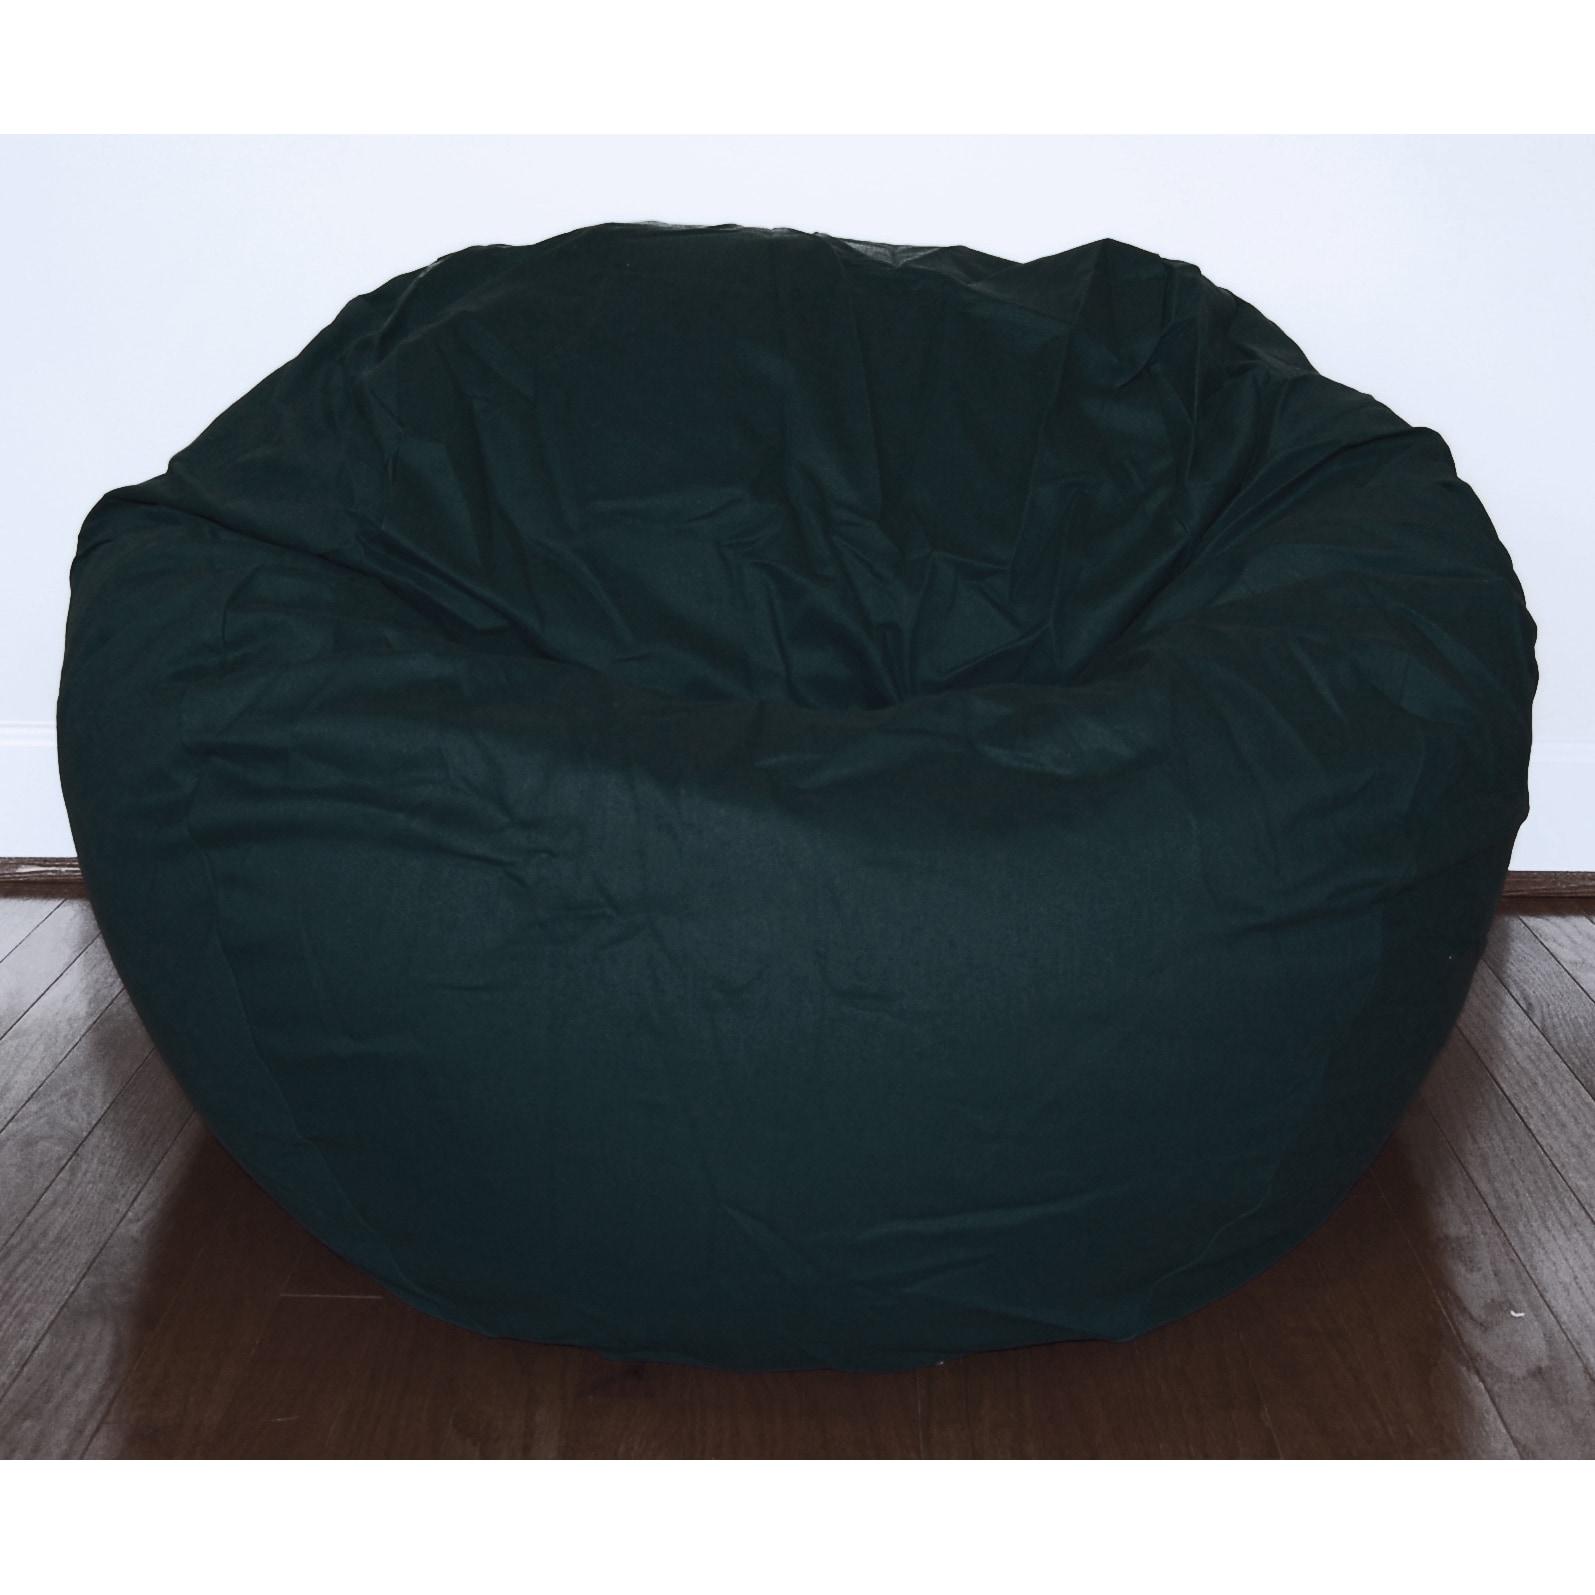 Brilliant Black Cotton Twill 36 Inch Washable Bean Bag Chair Cjindustries Chair Design For Home Cjindustriesco